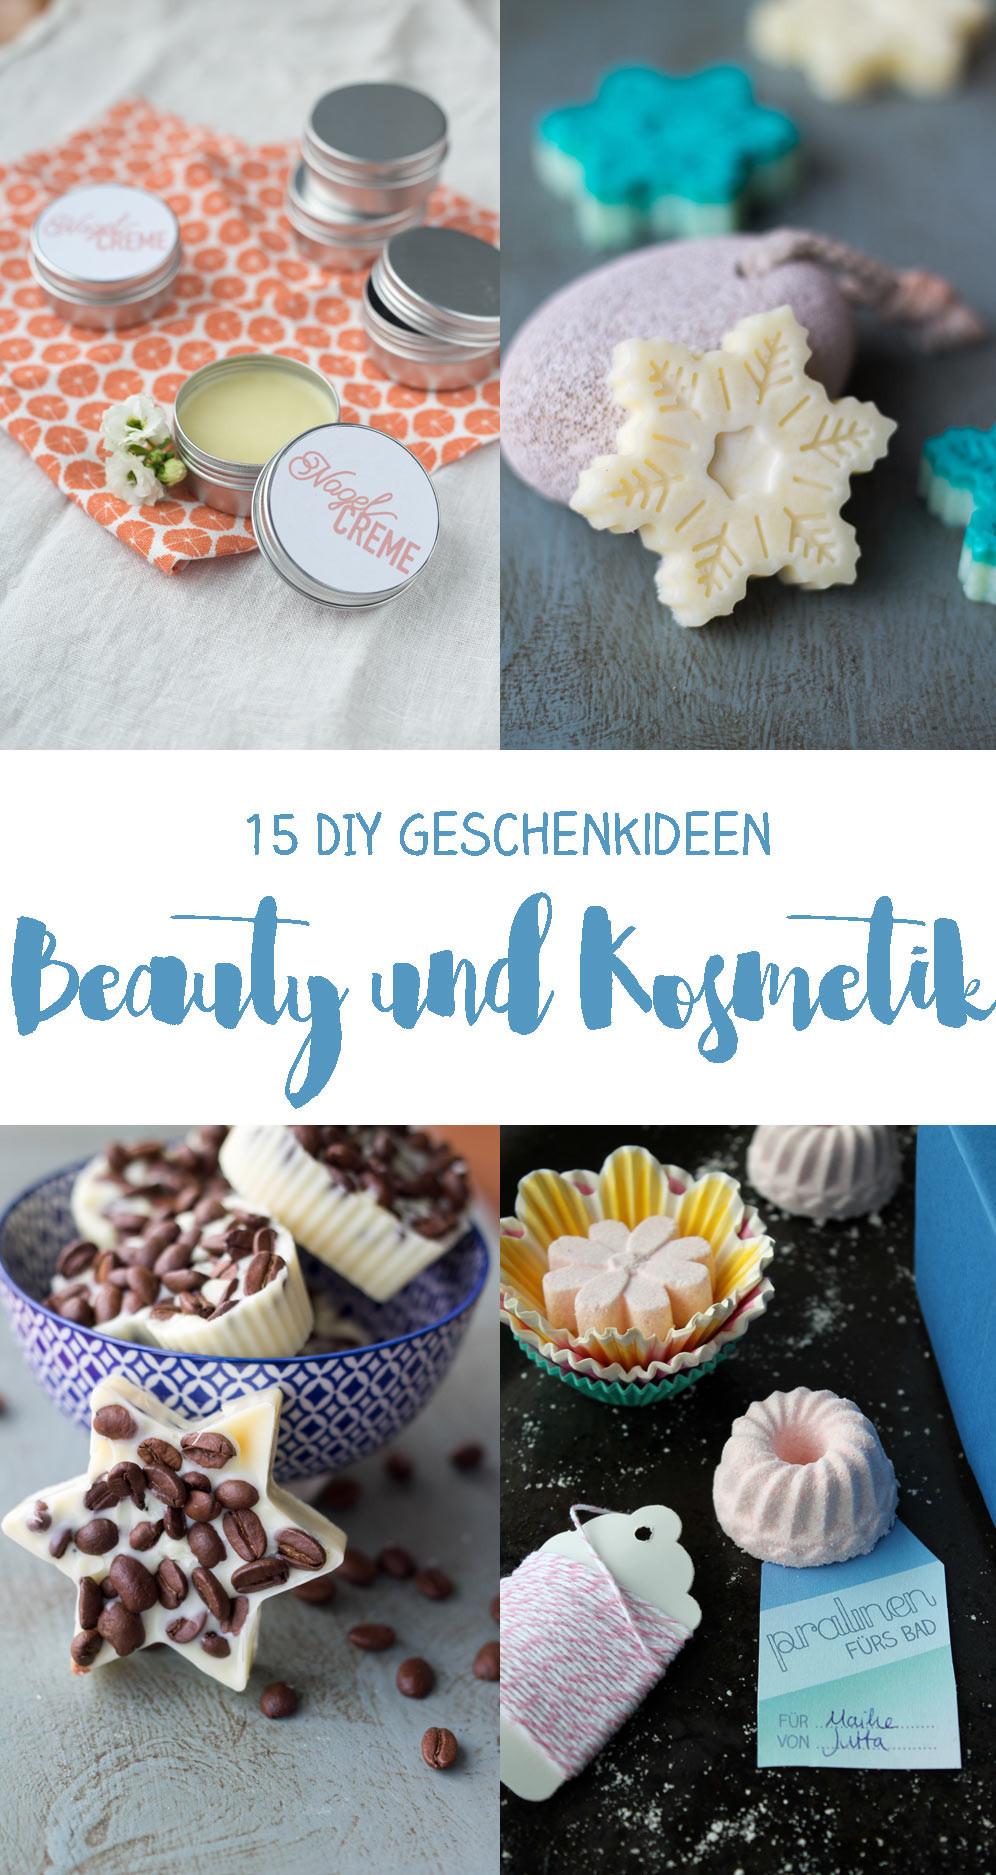 Diy Kosmetik  15 DIY Kosmetik Geschenkideen zum Selbermachen